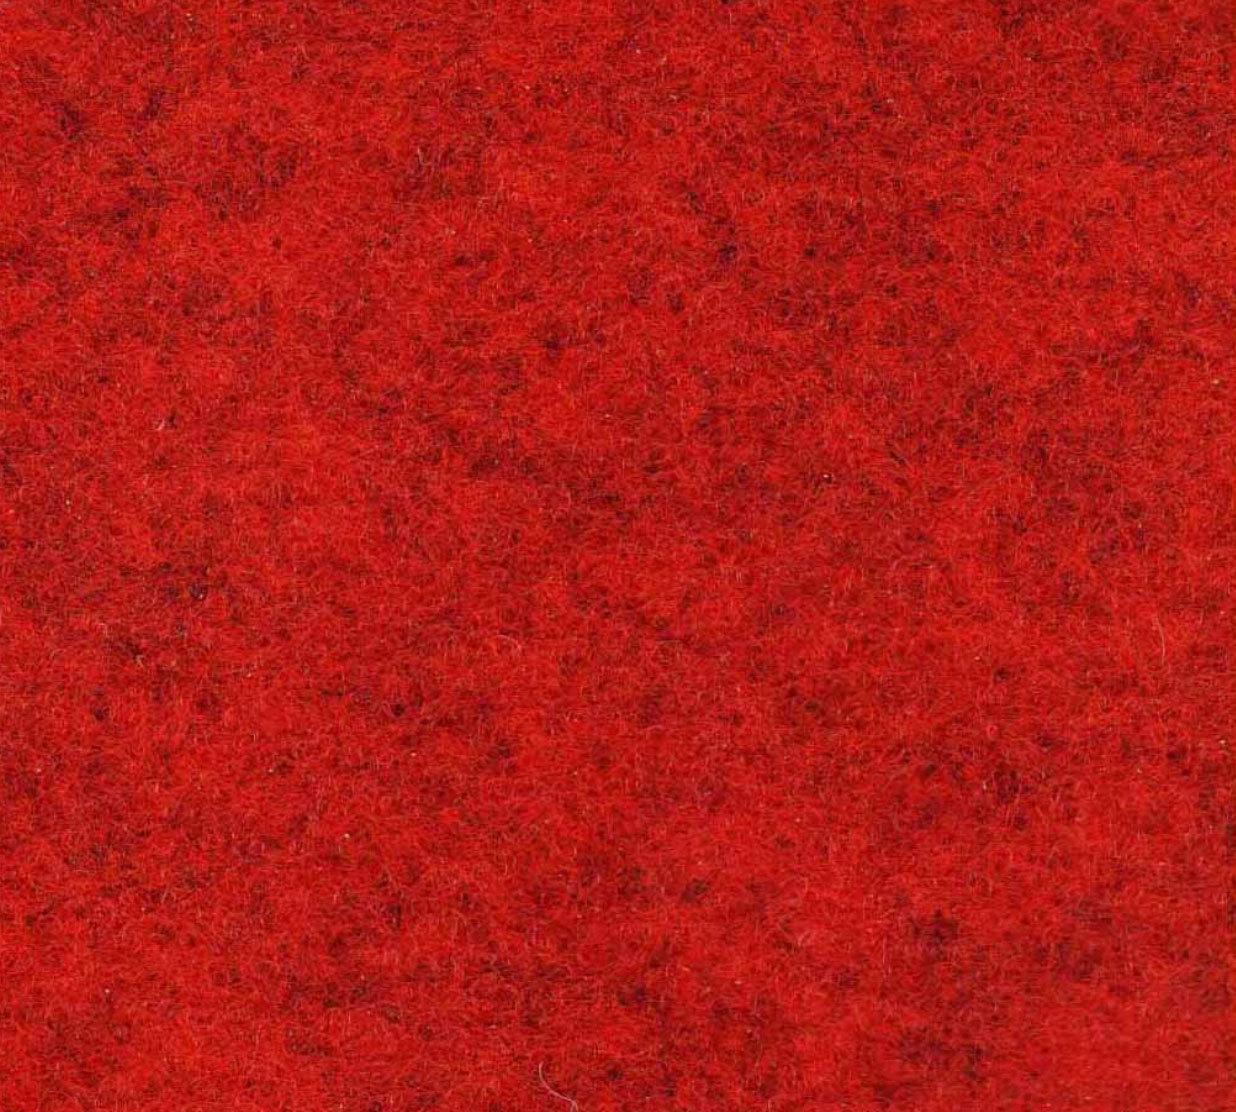 Röd matta – Slät Nålfiltsmatta 4m